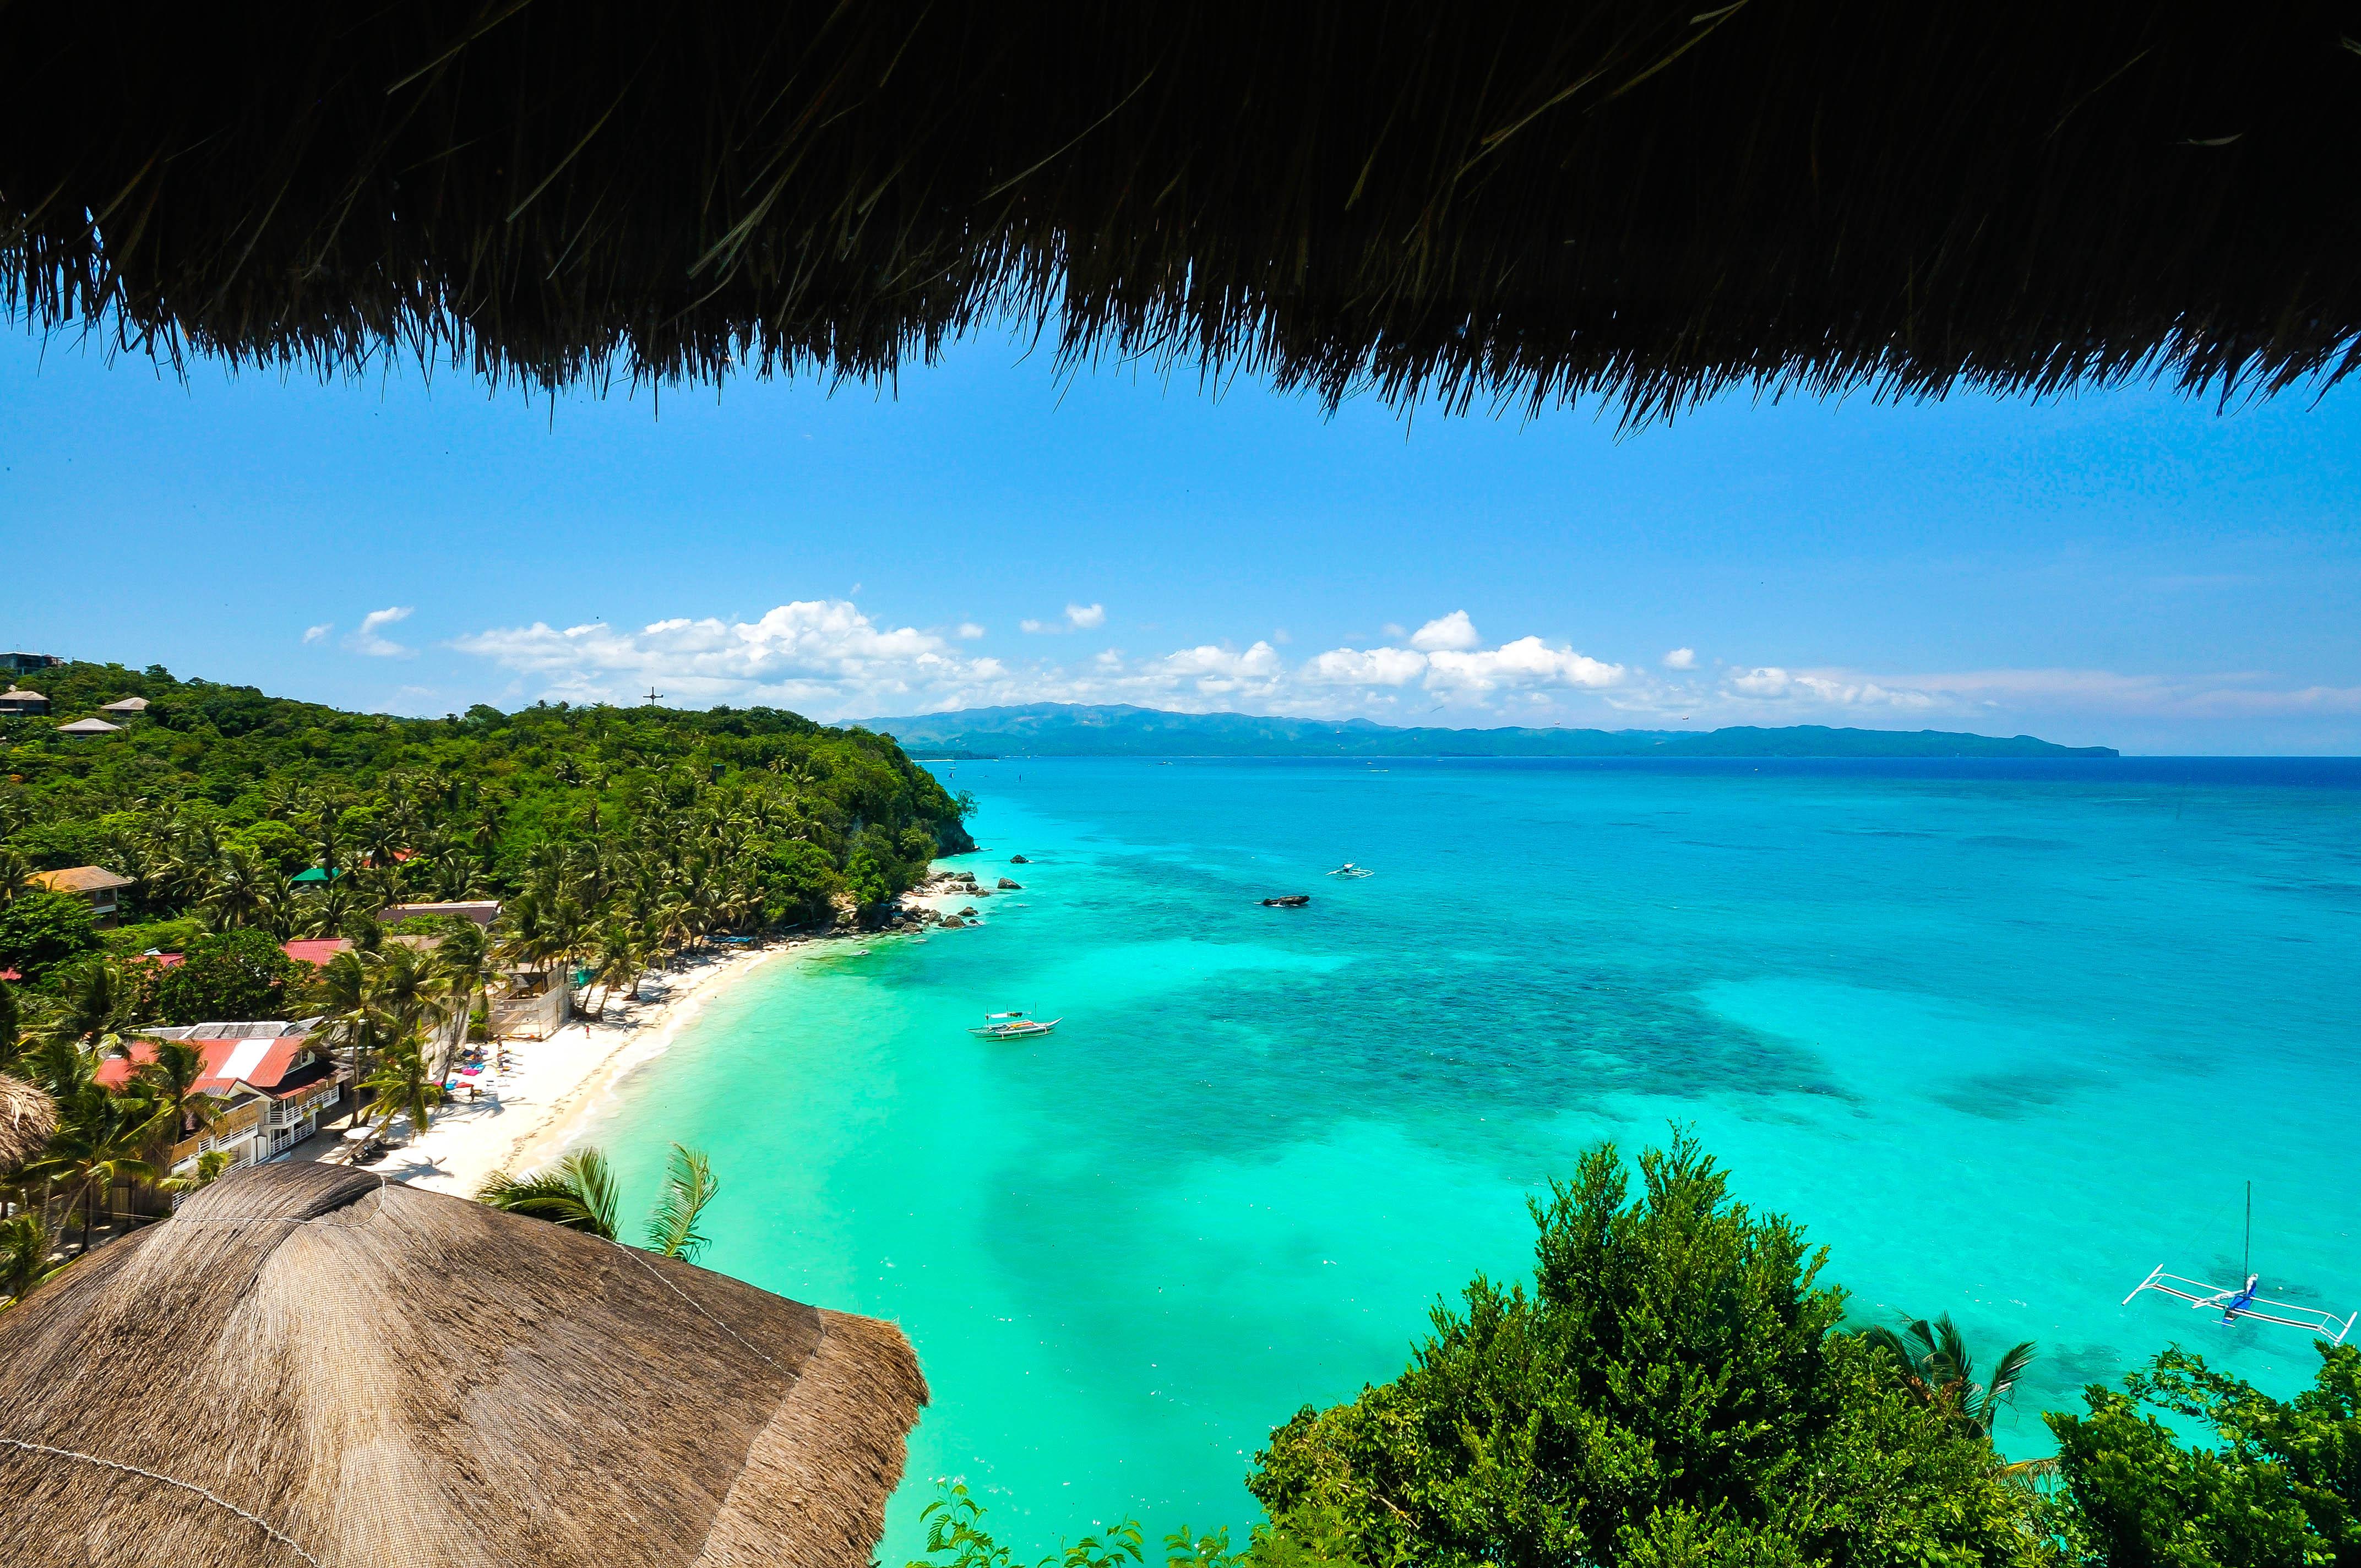 Nami Resort Boracay